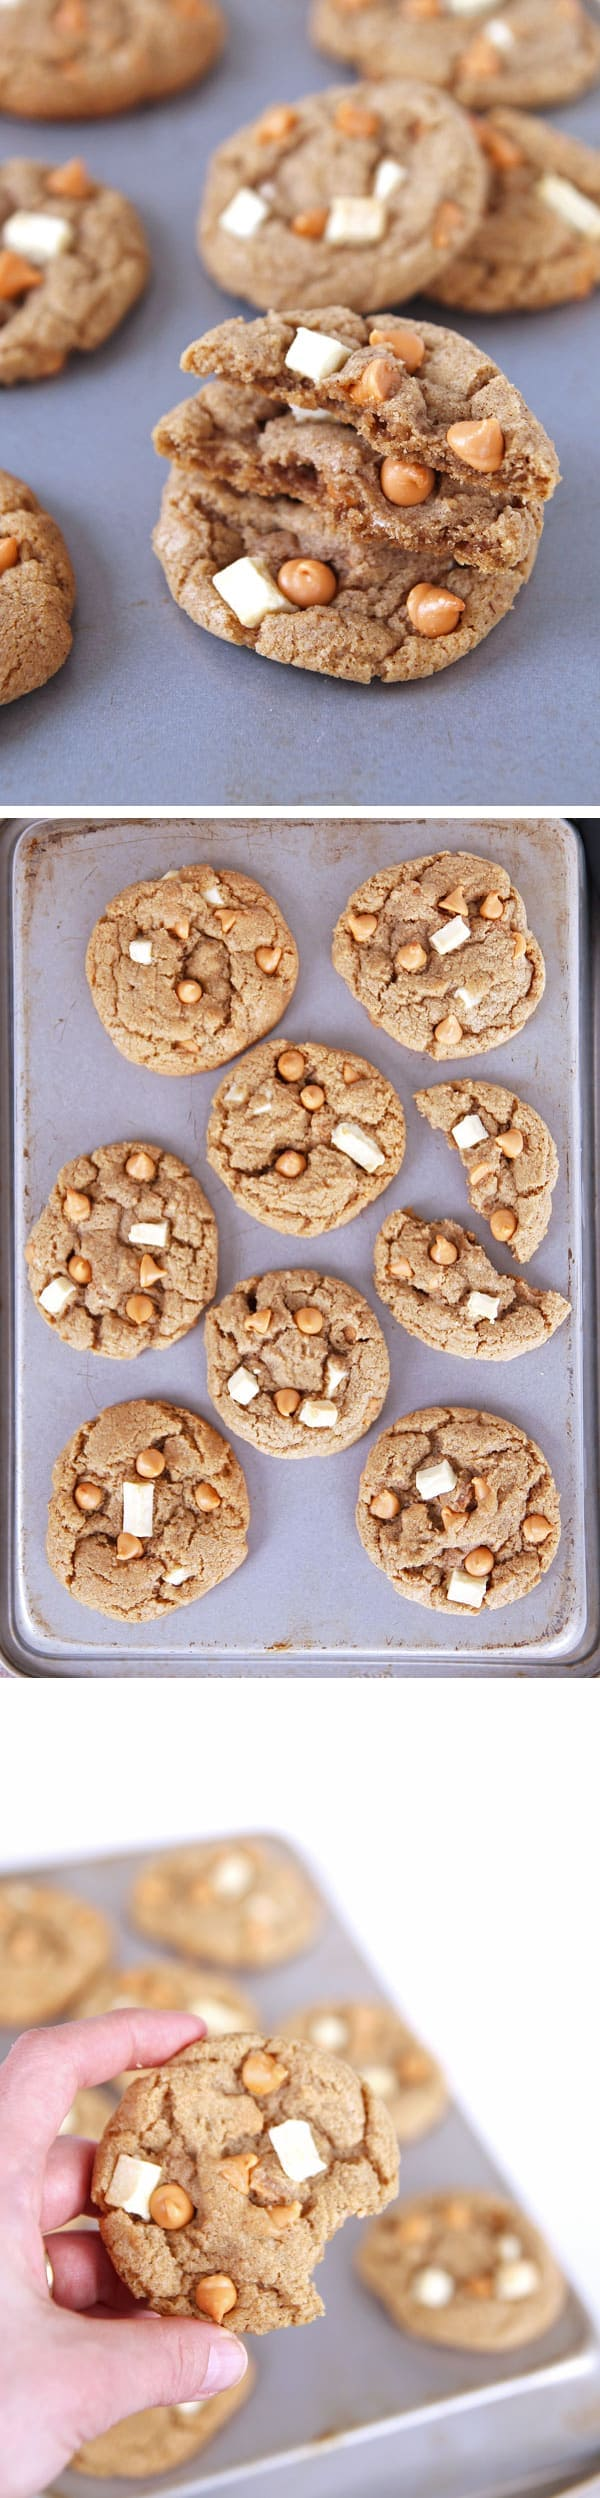 Brown Butter Scotch Cookie